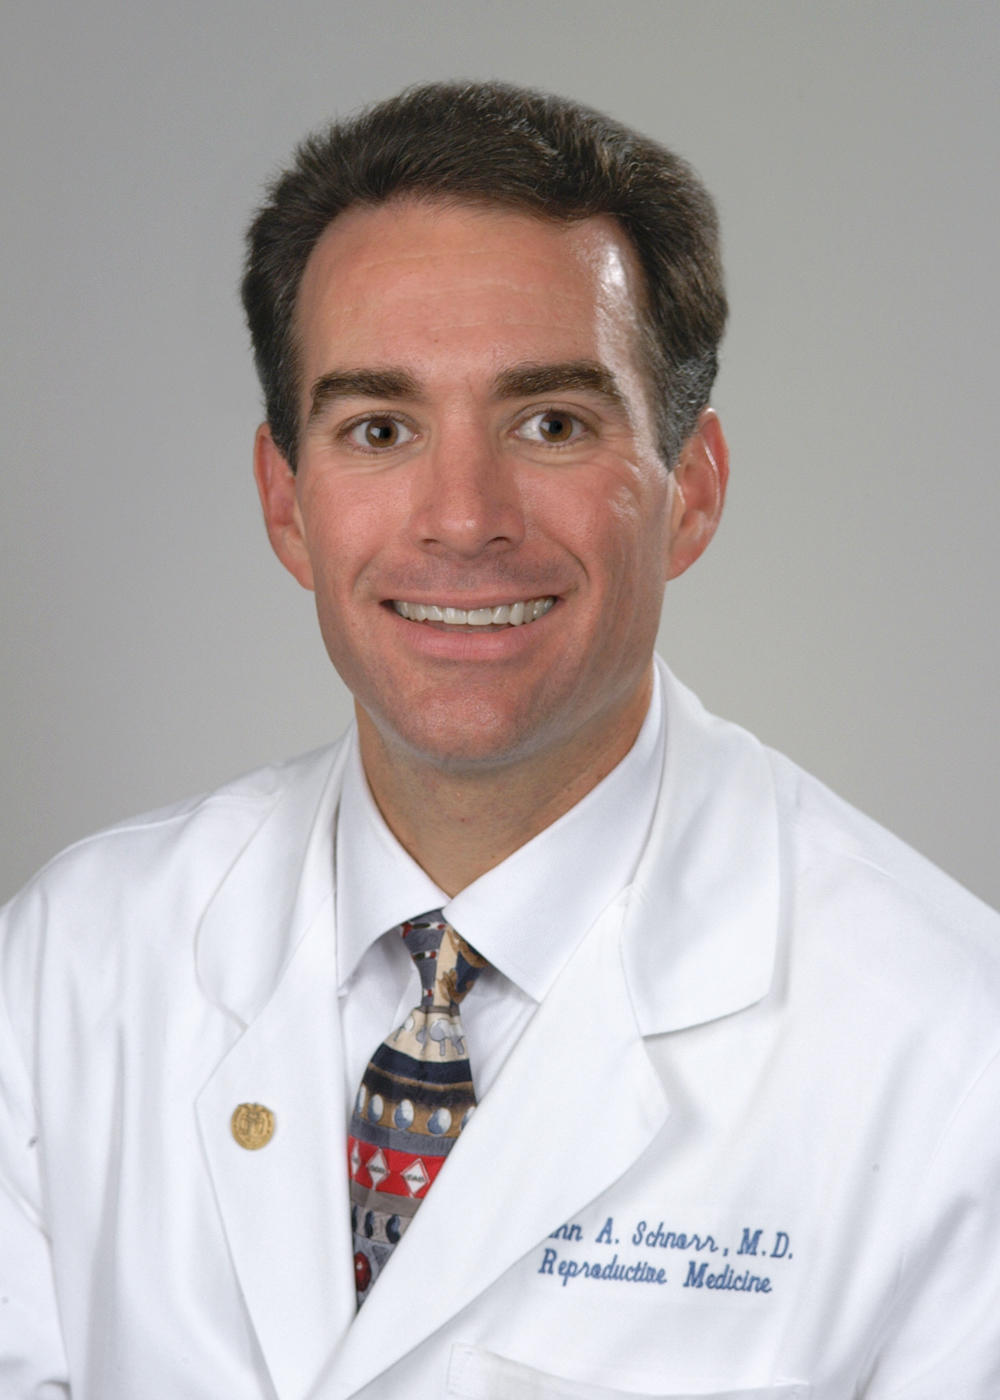 John A. Schnorr, MD